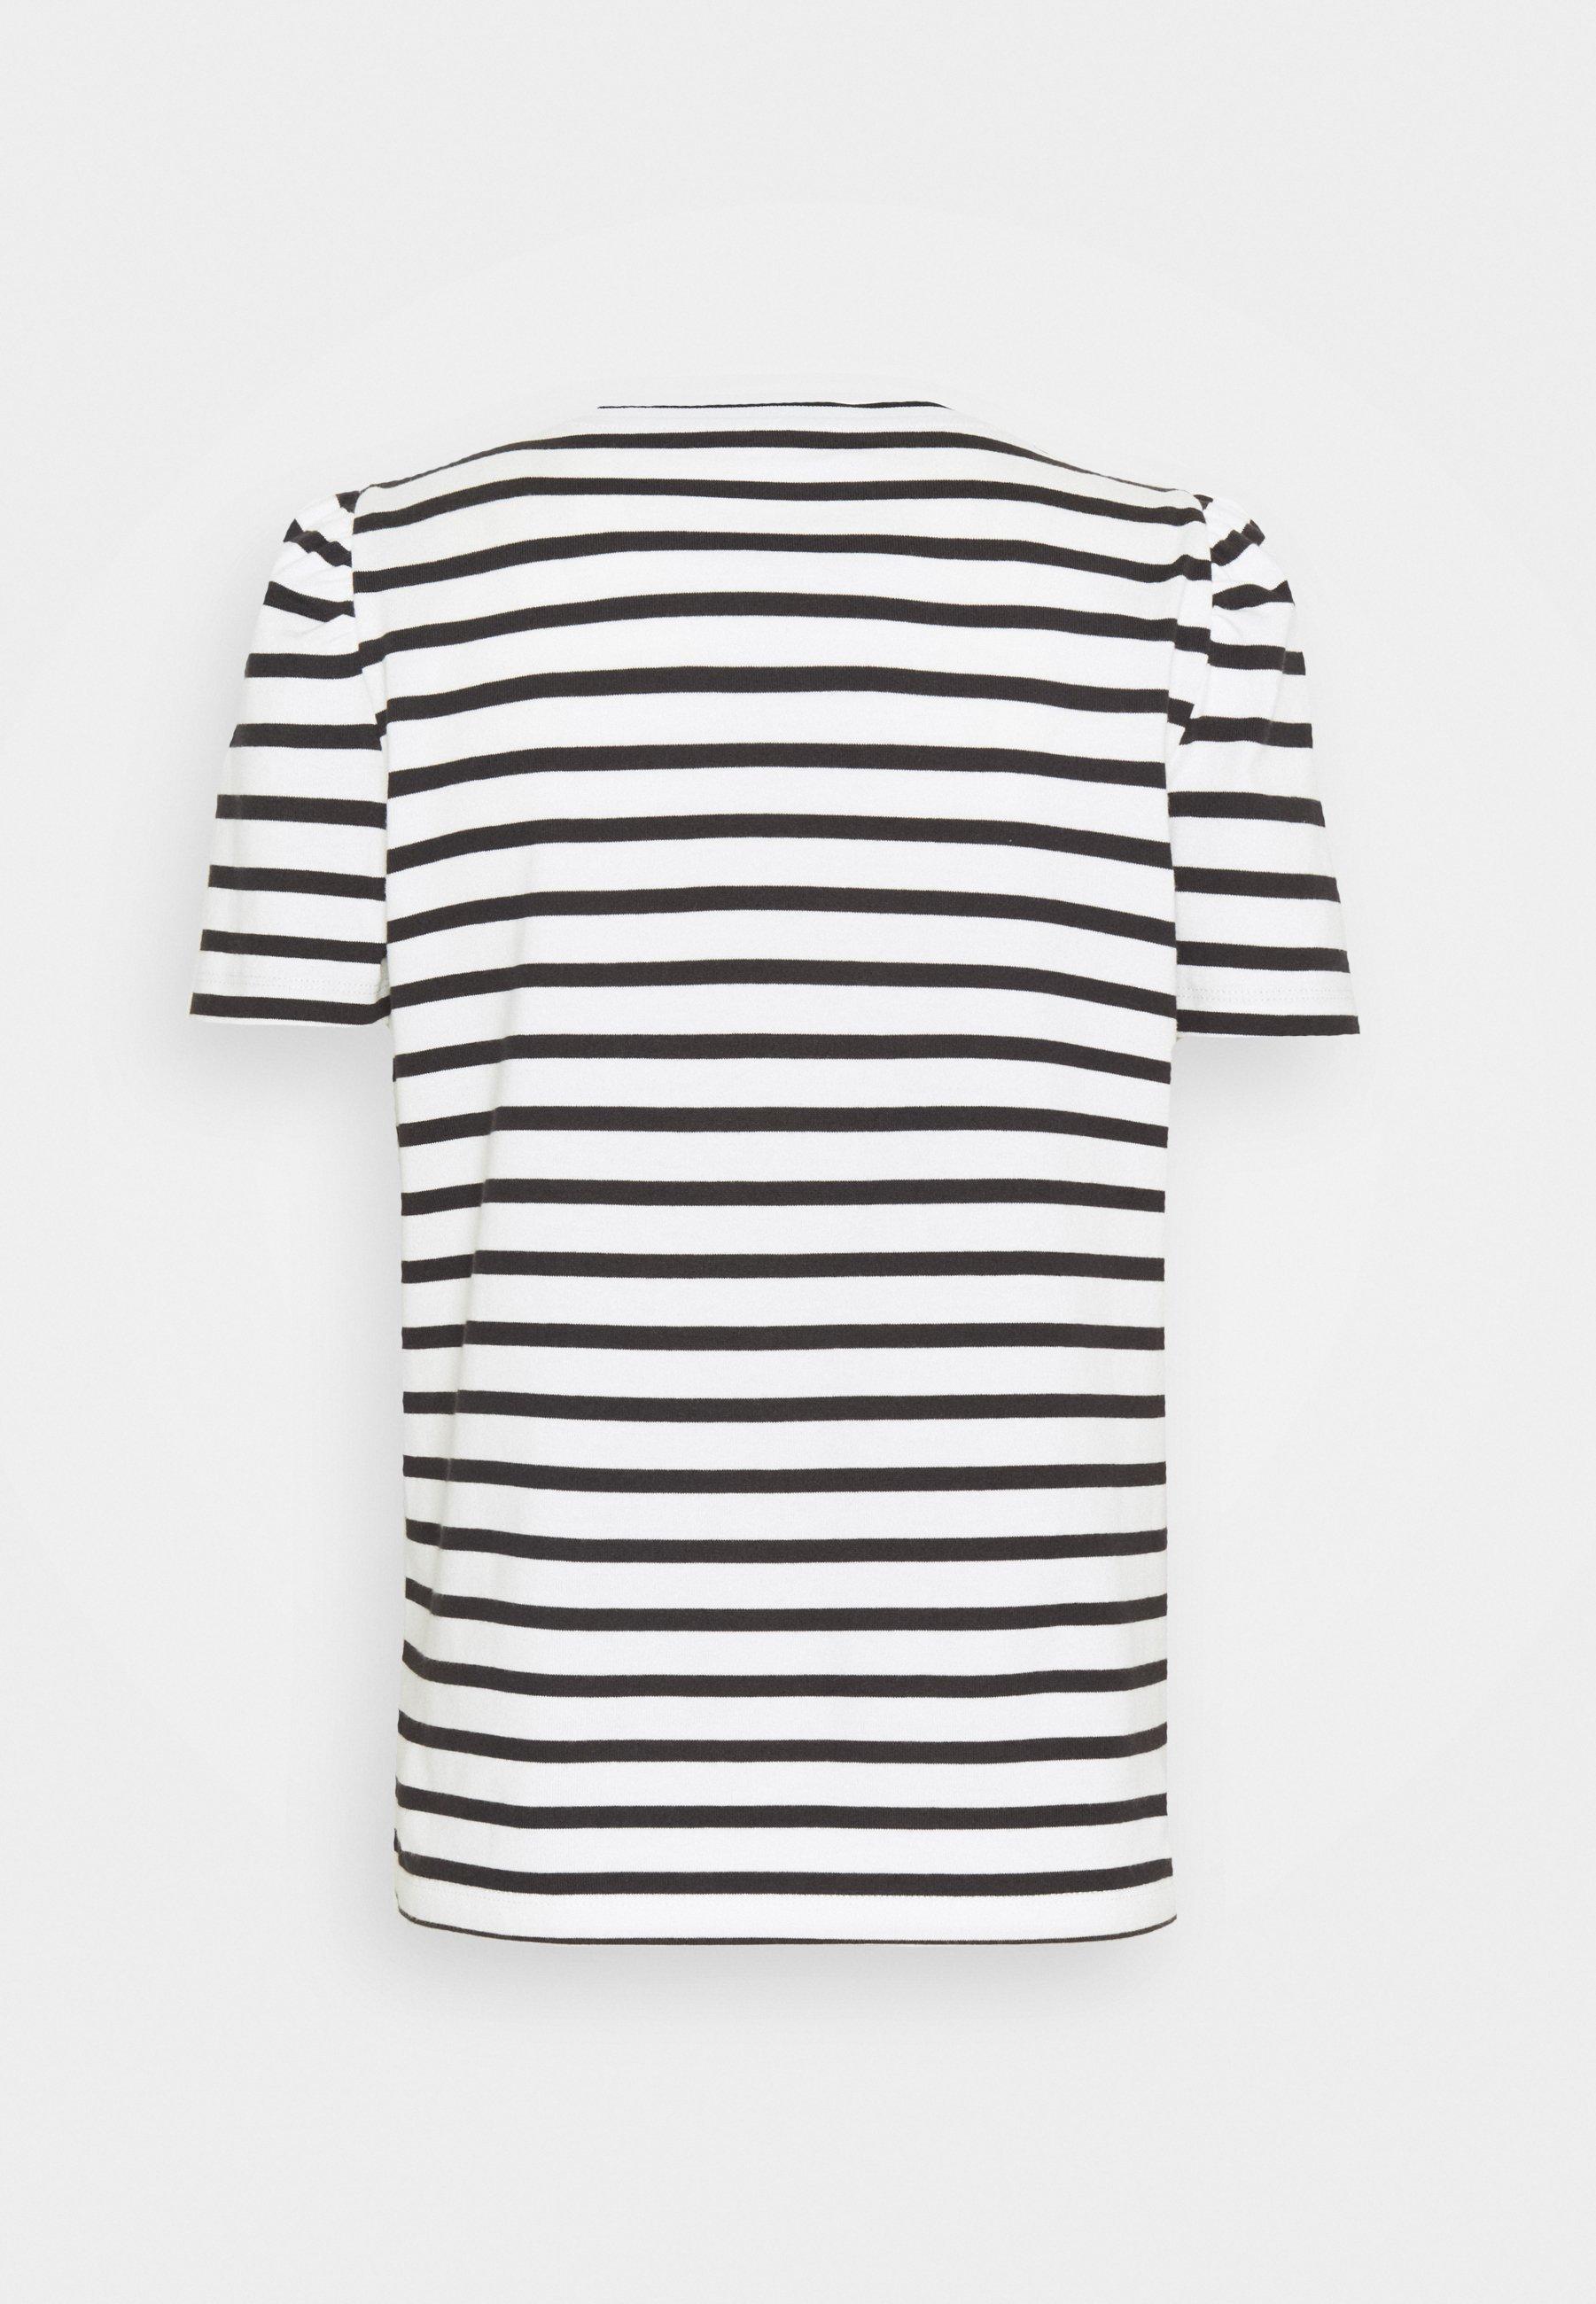 Kate Spade New York Stripe Puff Sleeve Tee - T-shirts Med Print Cream/offwhite